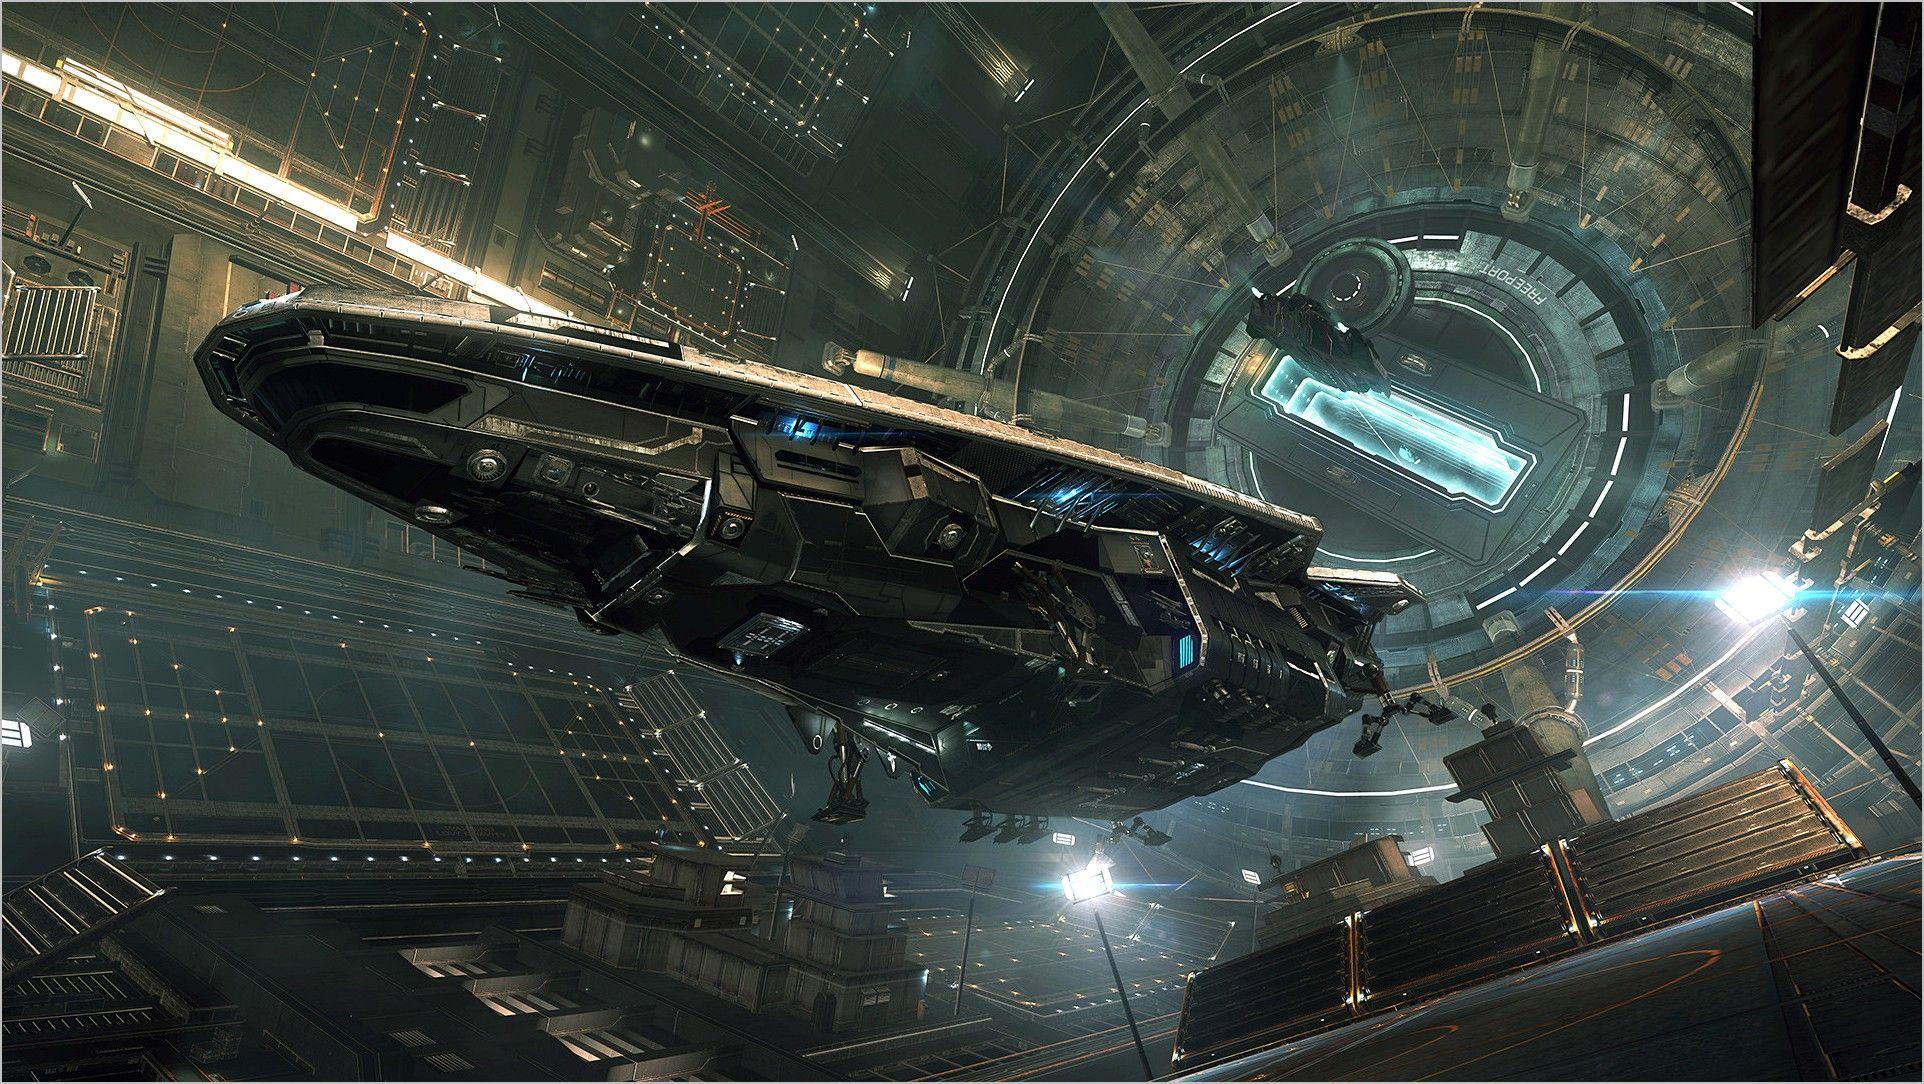 Elite Dangerous Federation 4k Wallpaper In 2020 Spaceship Art Science Fiction Artwork Sci Fi Spaceships